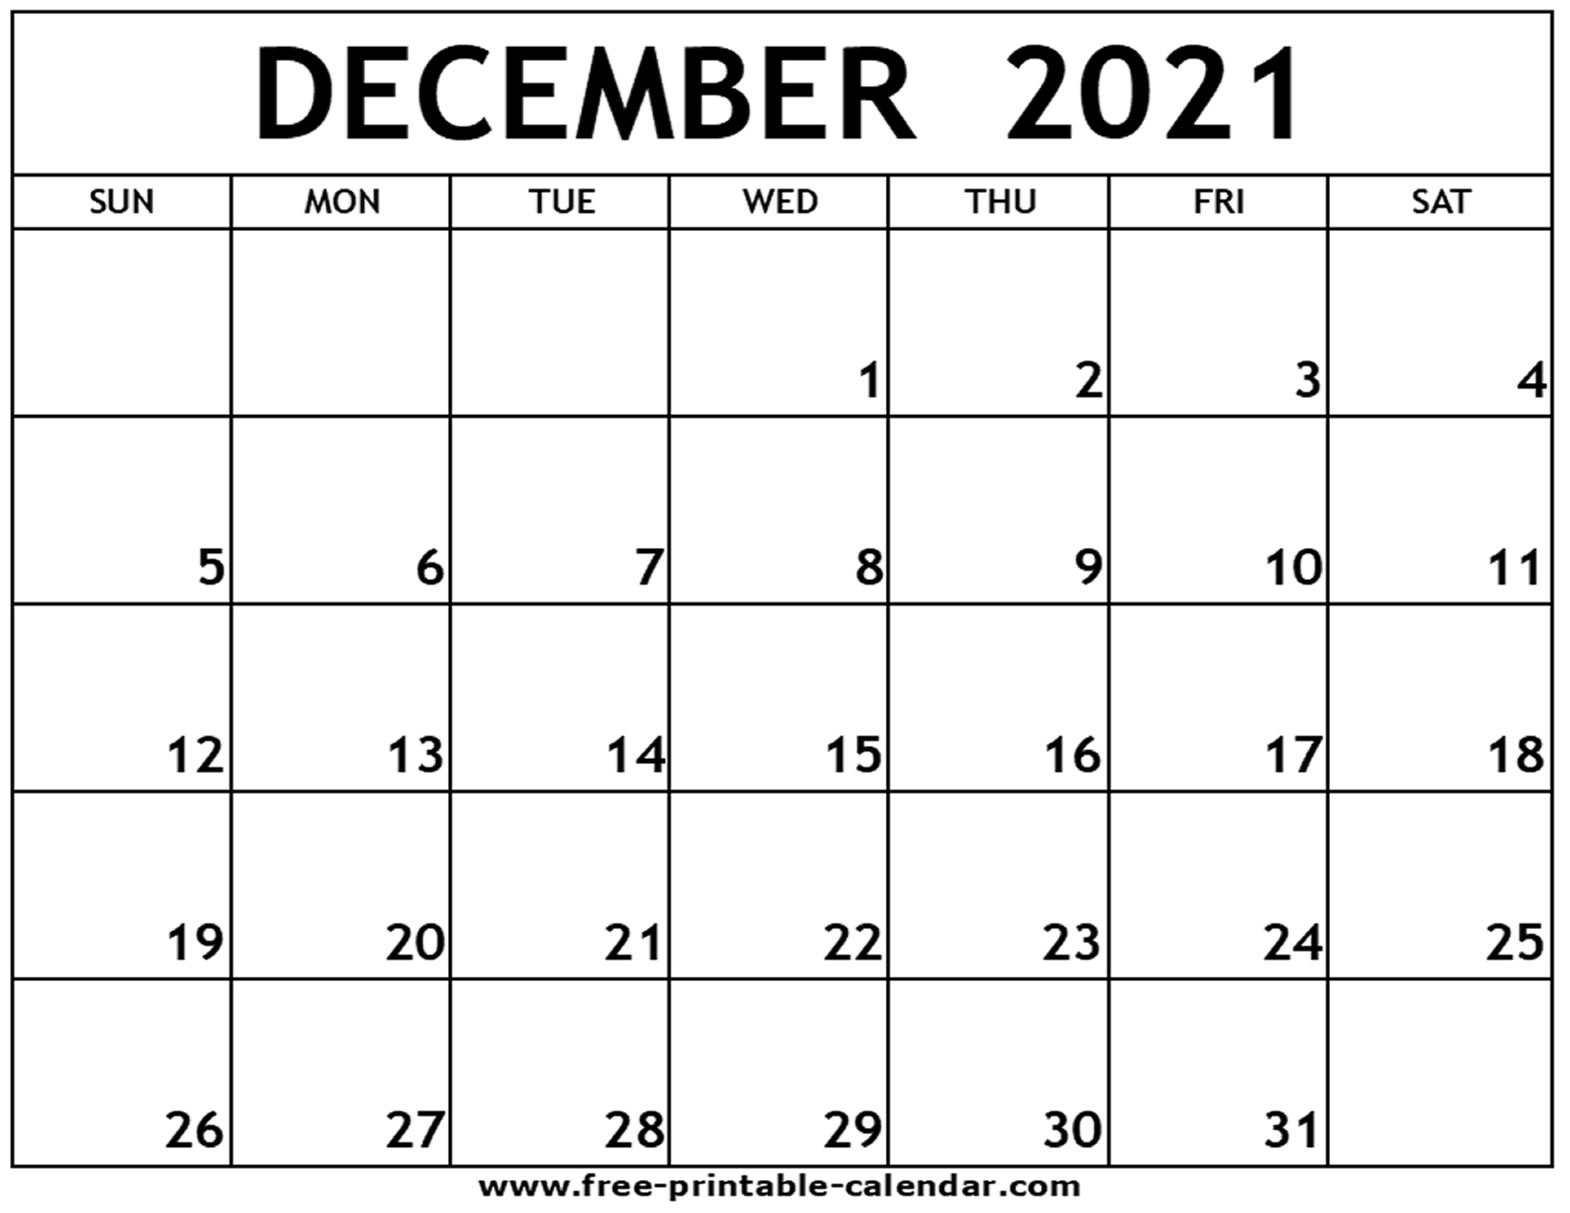 Pick August - December 2021 Calendar Printable